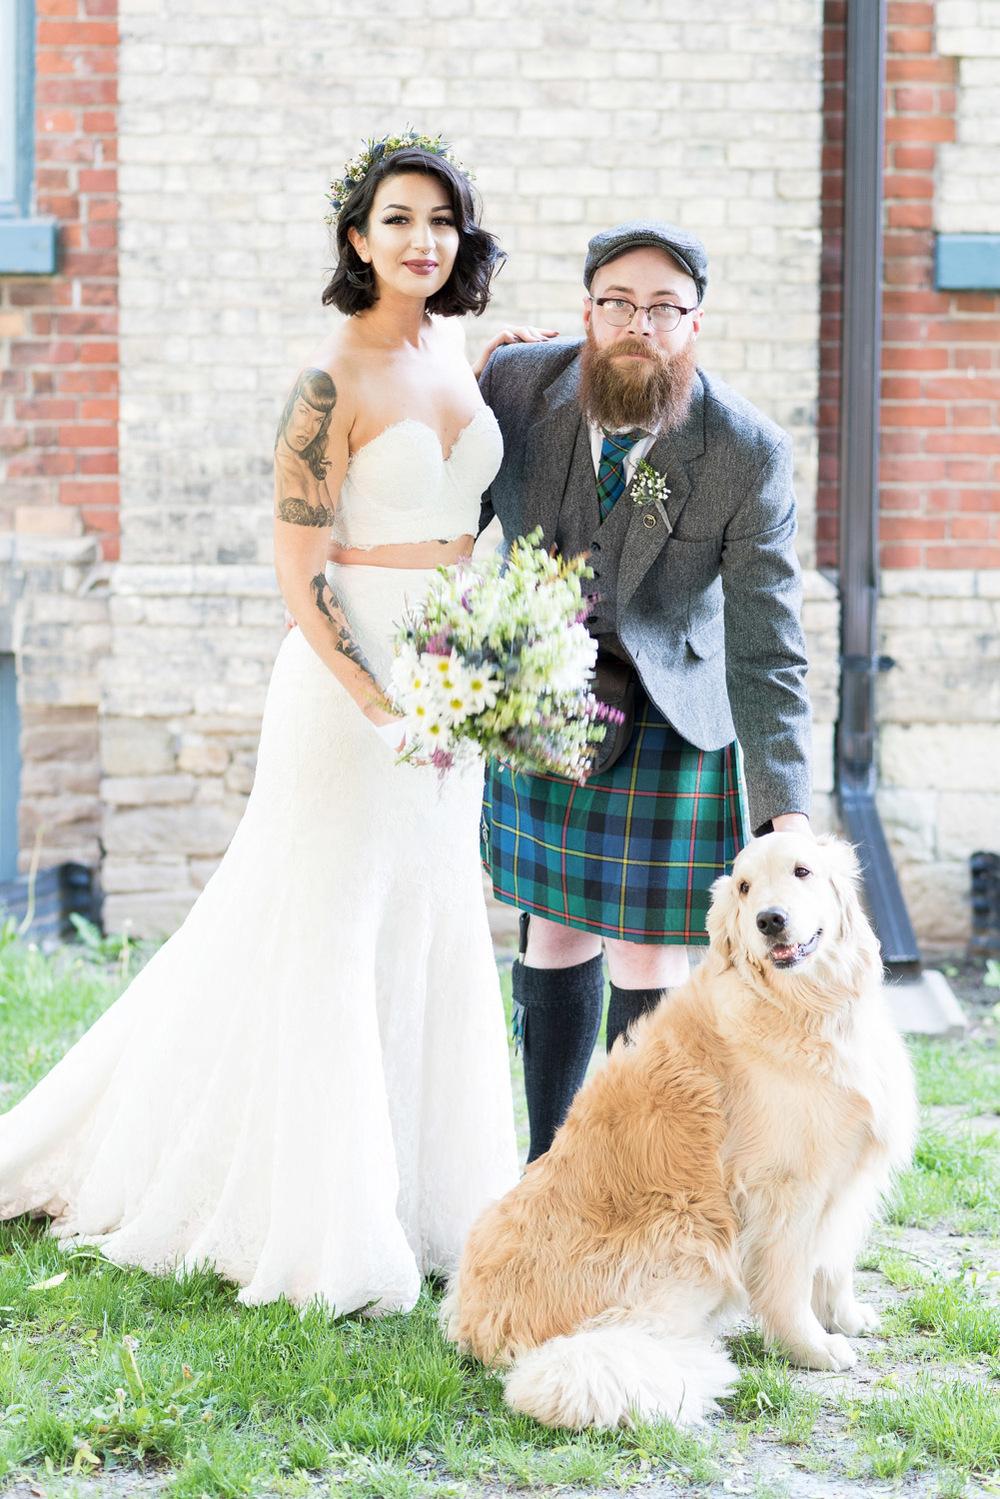 S&M_TORONTO_WEDDING_PHOTOGRAPHY_015.jpg